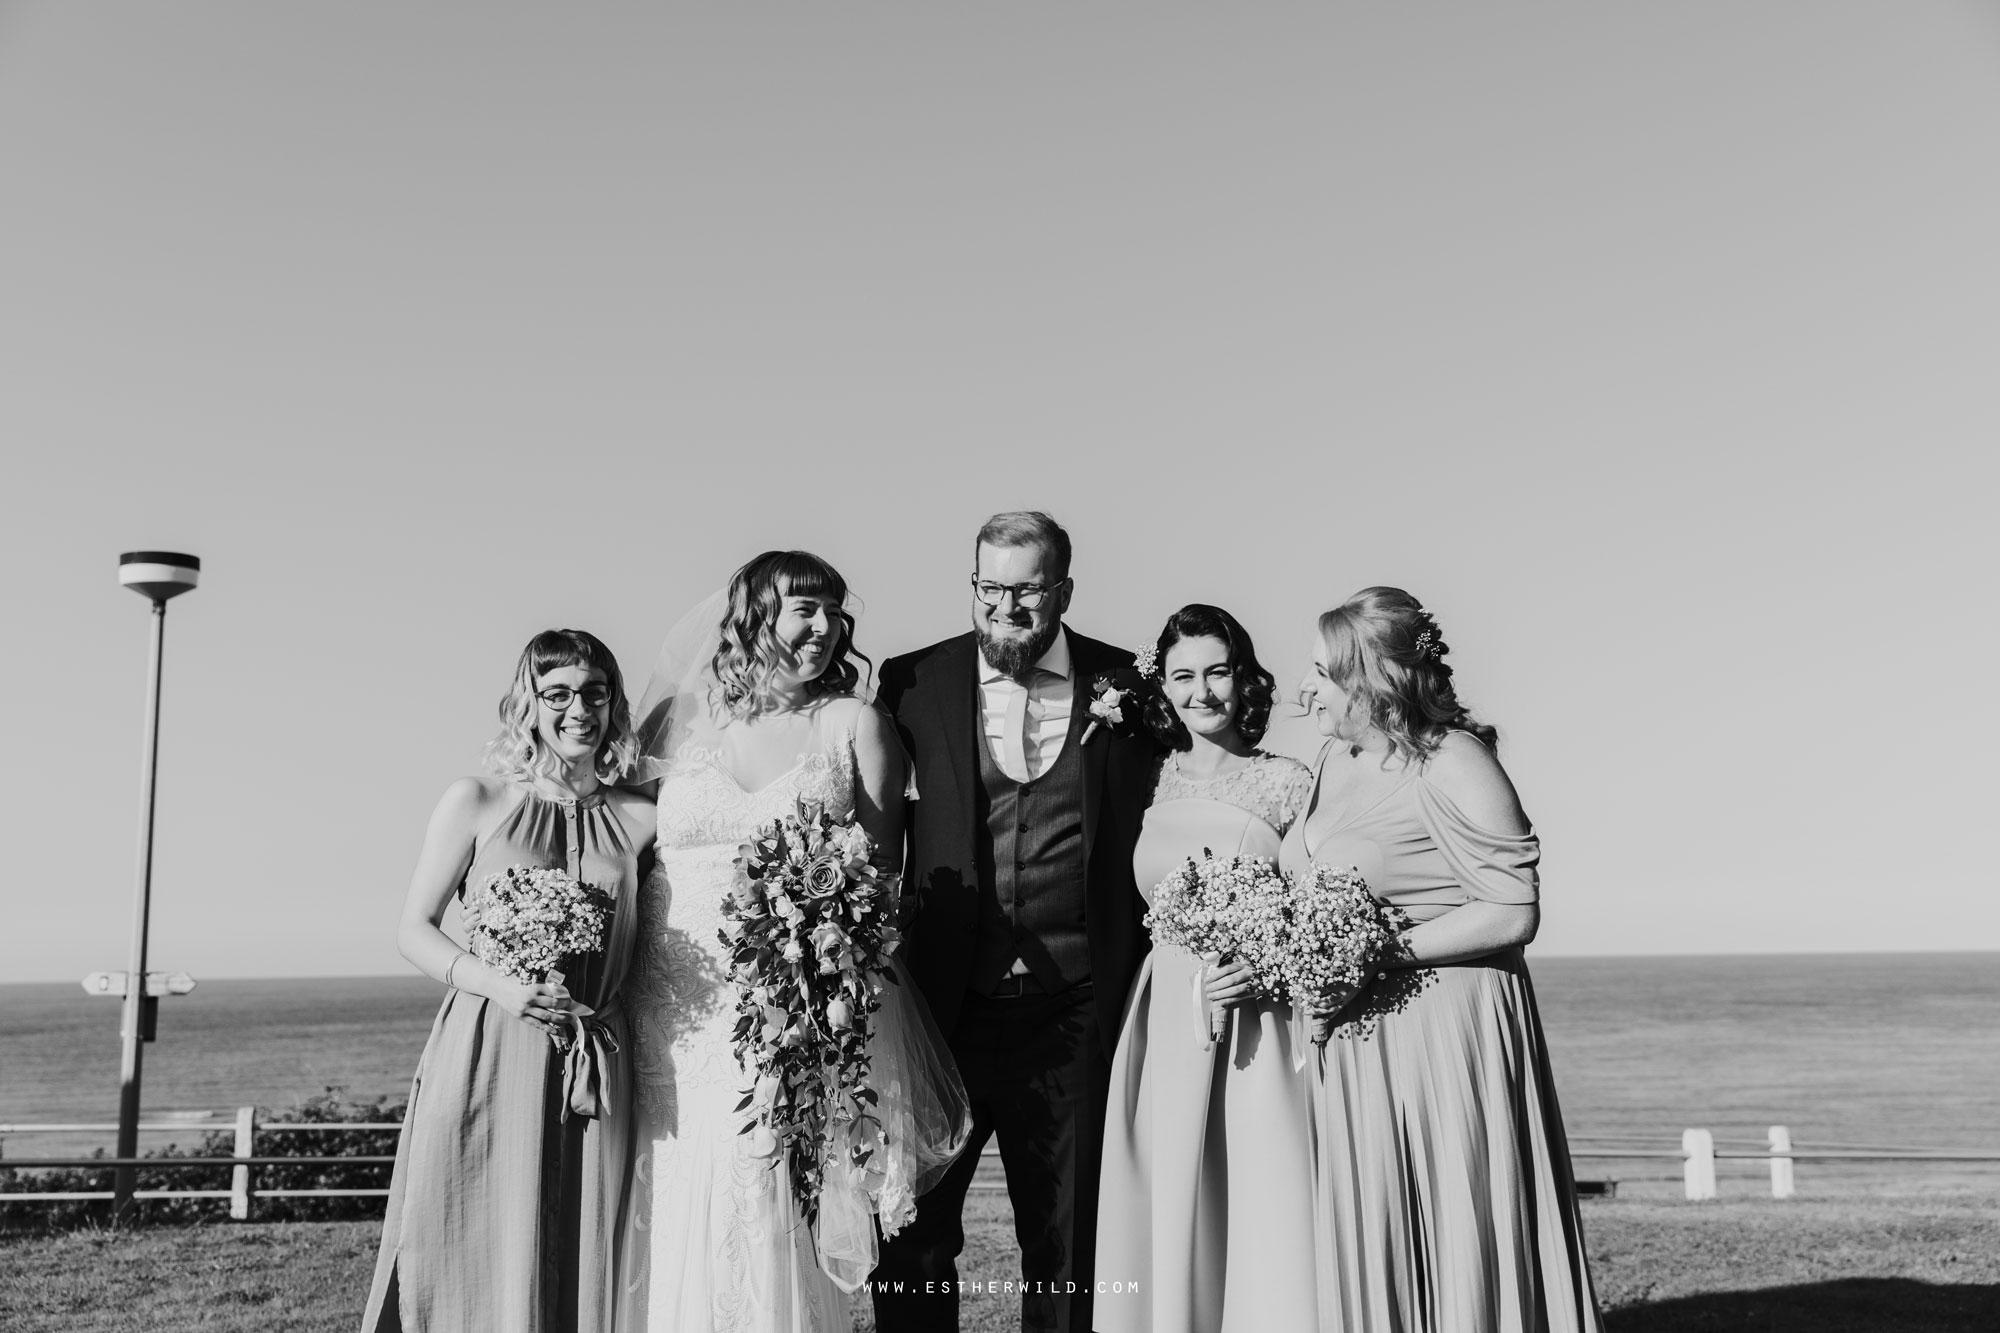 Cromer_Wedding_Beach_Outdoor_Ceremony_Norfolk_North_Lodge_Registry_Office_Rocket_House_Cafe_Cromer_Pier_IMG_4405-2.jpg